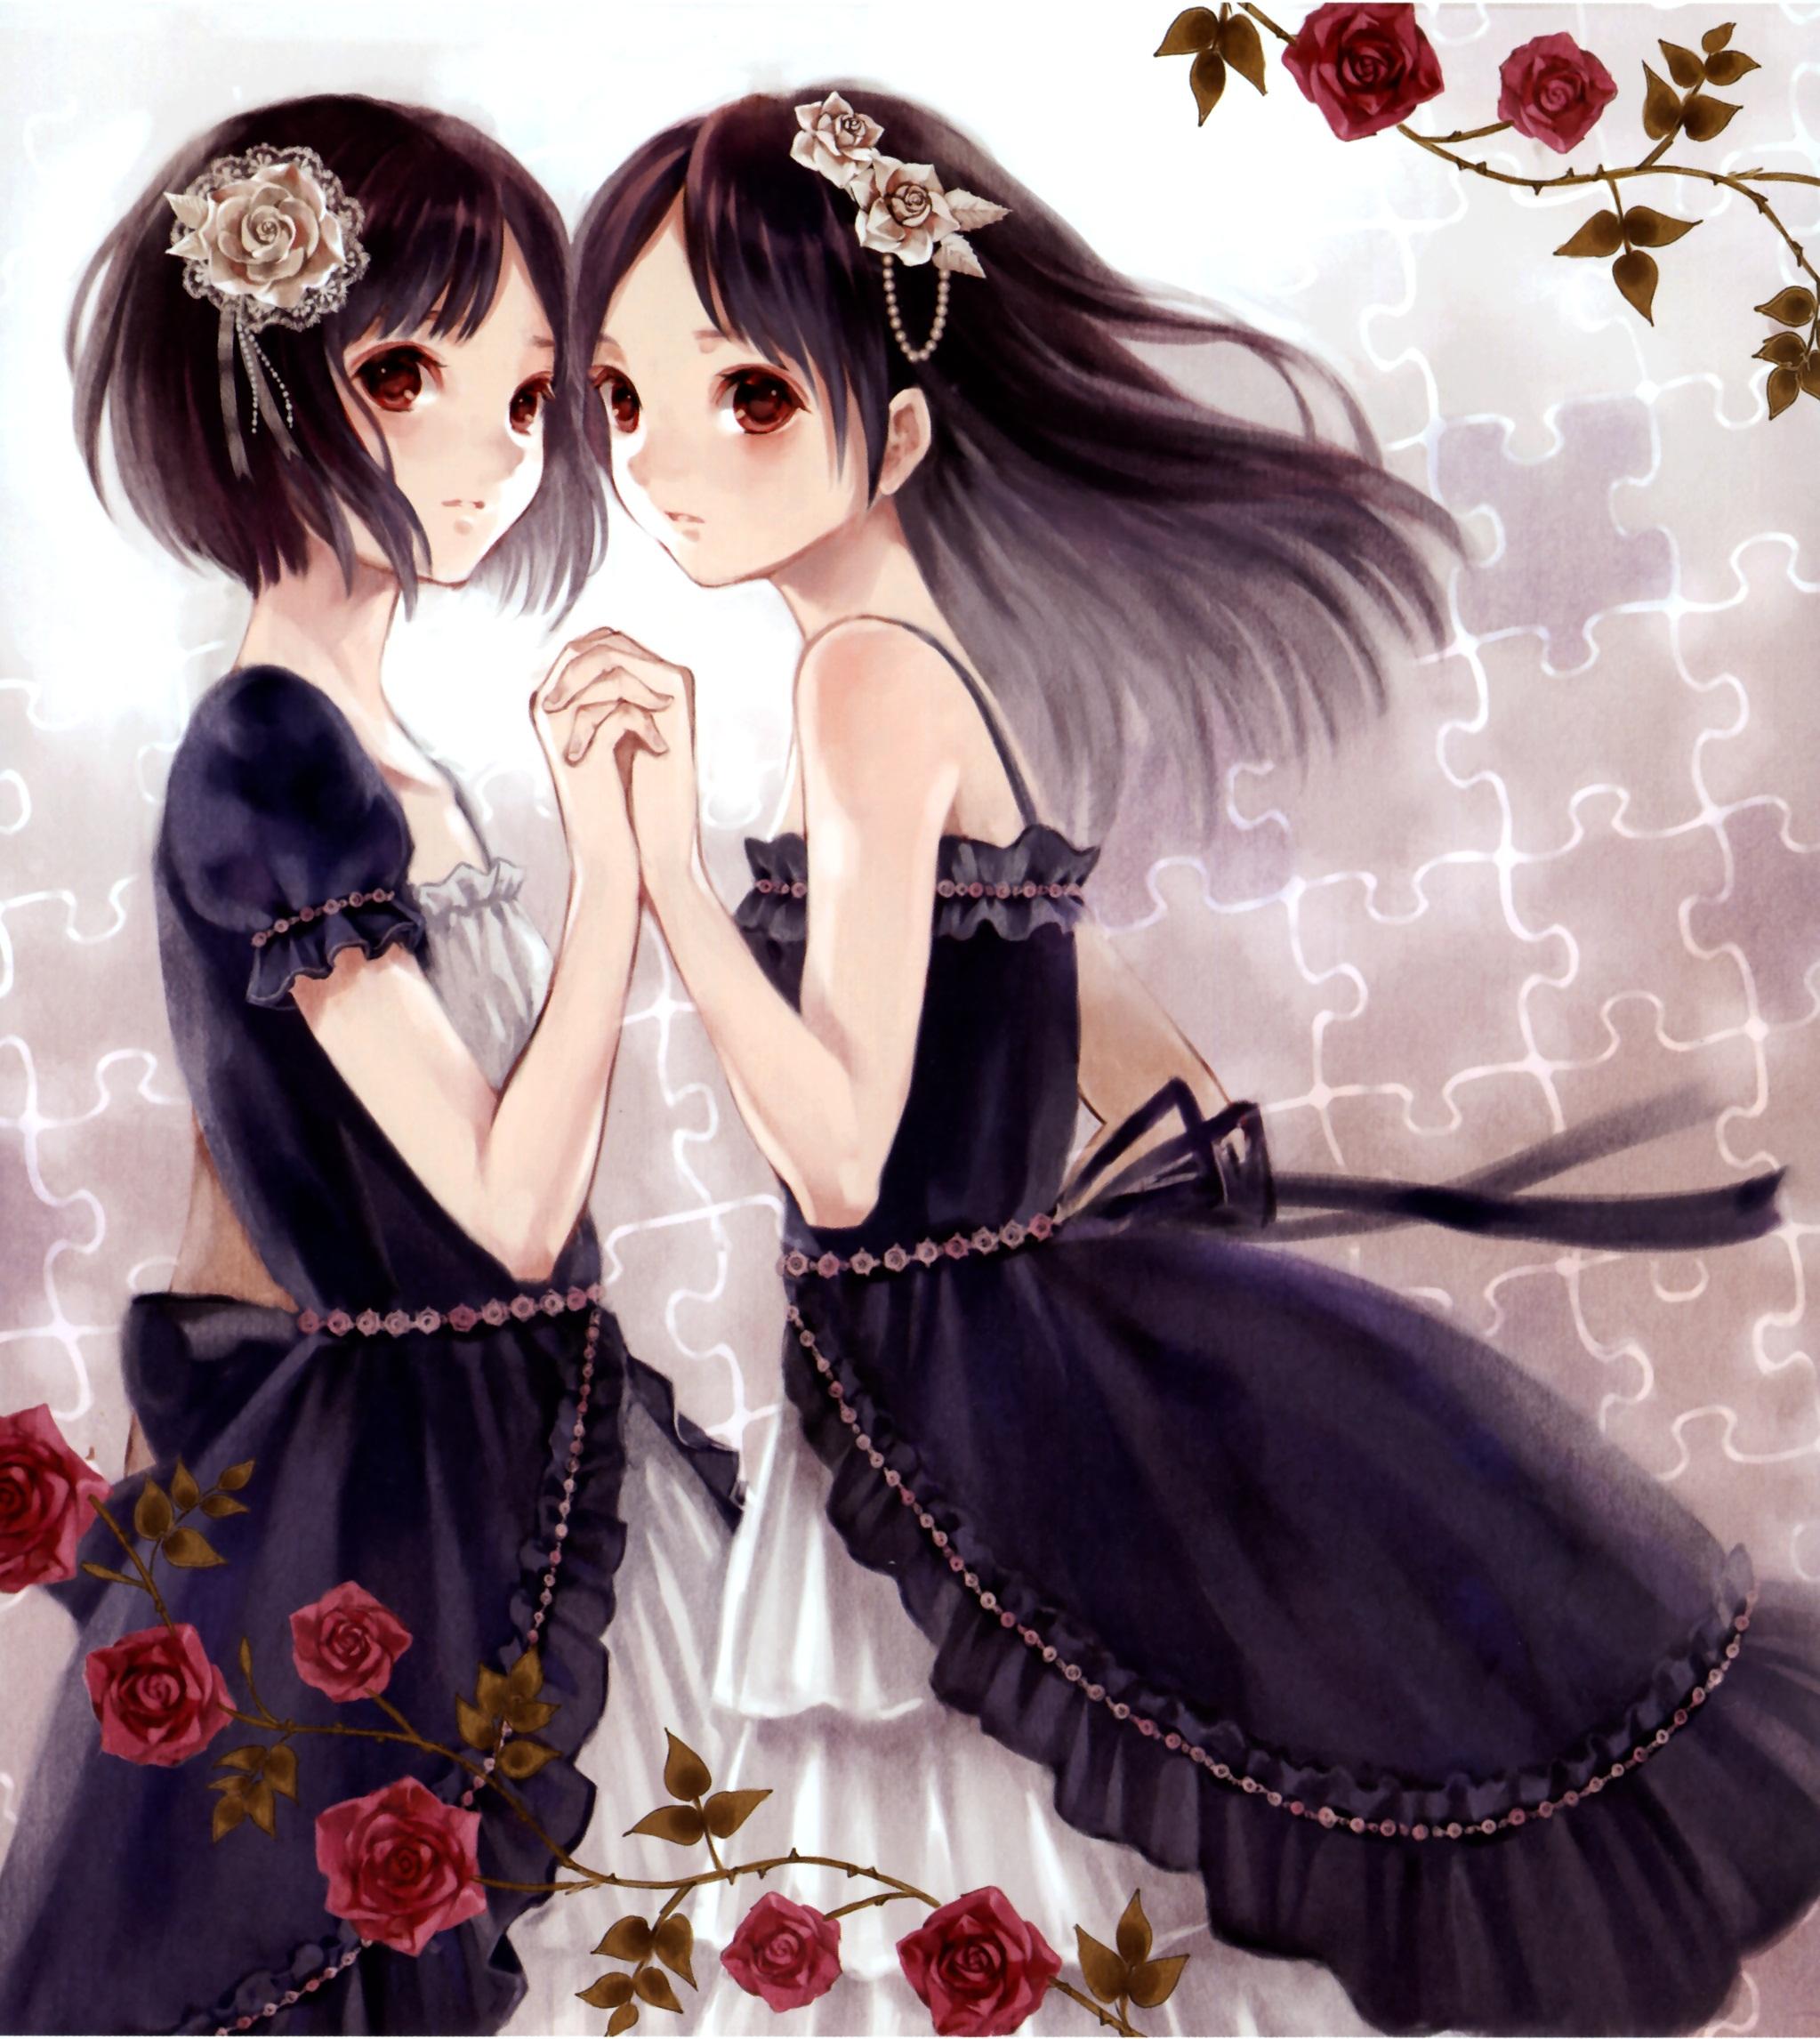 Two anime girls